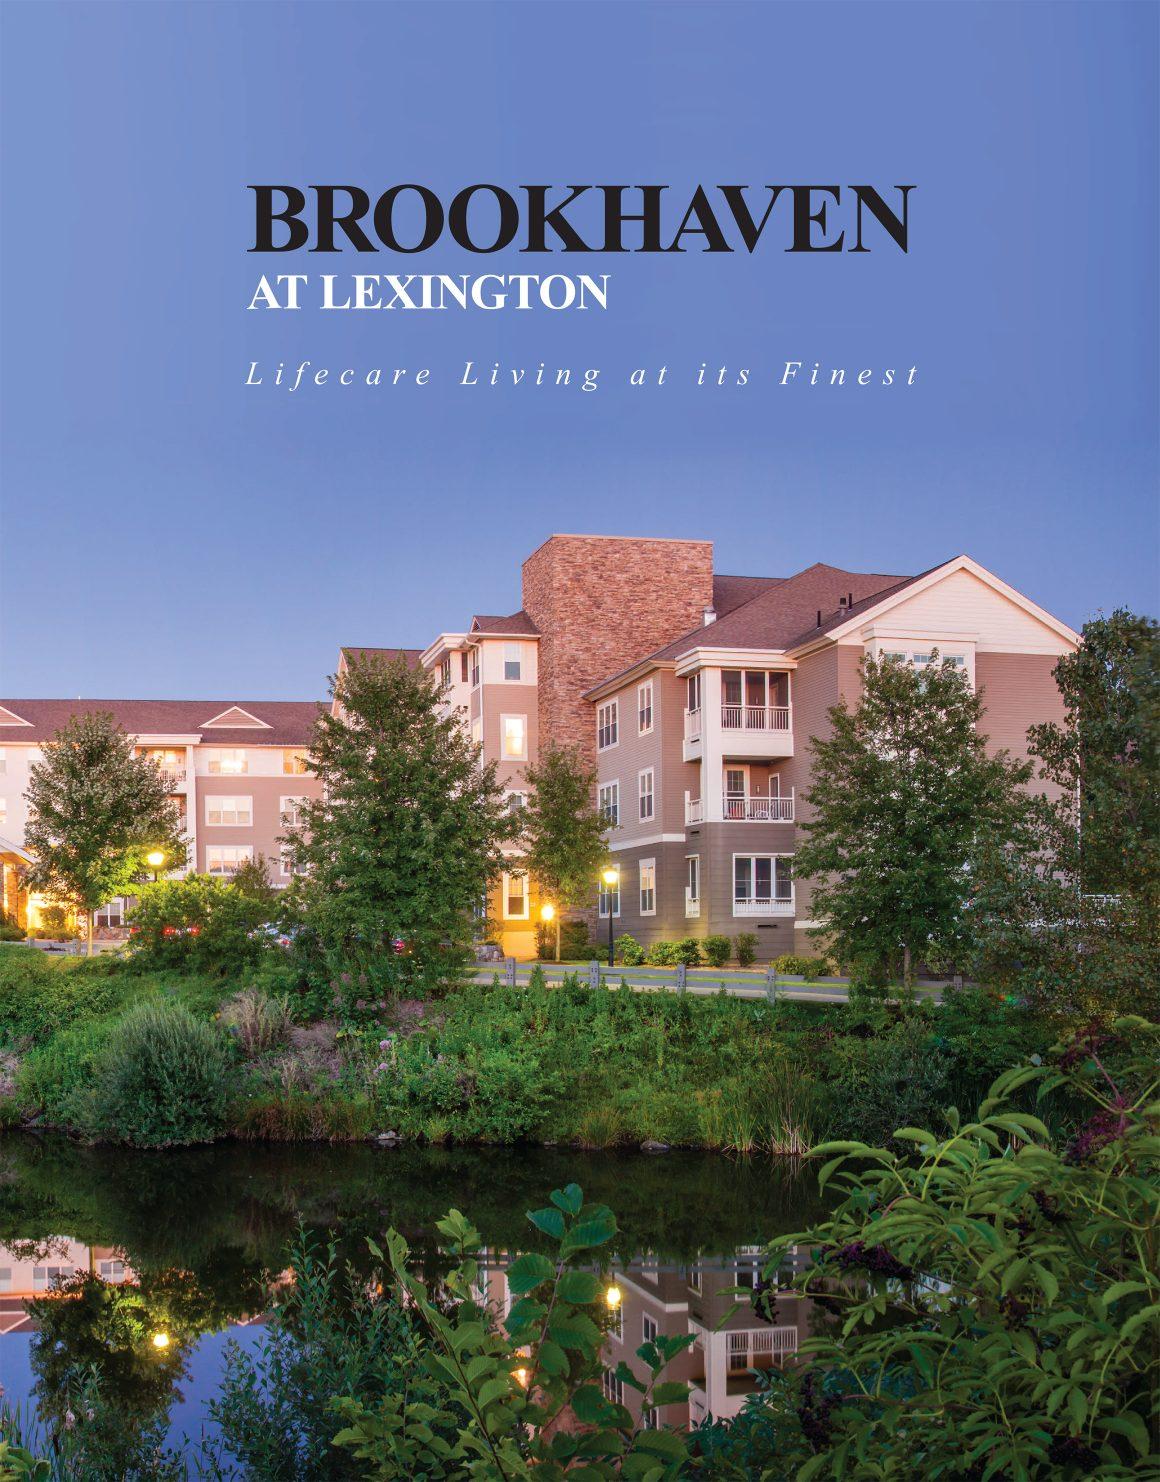 boston-graphic-design-kenneally-creative-brochure-15350